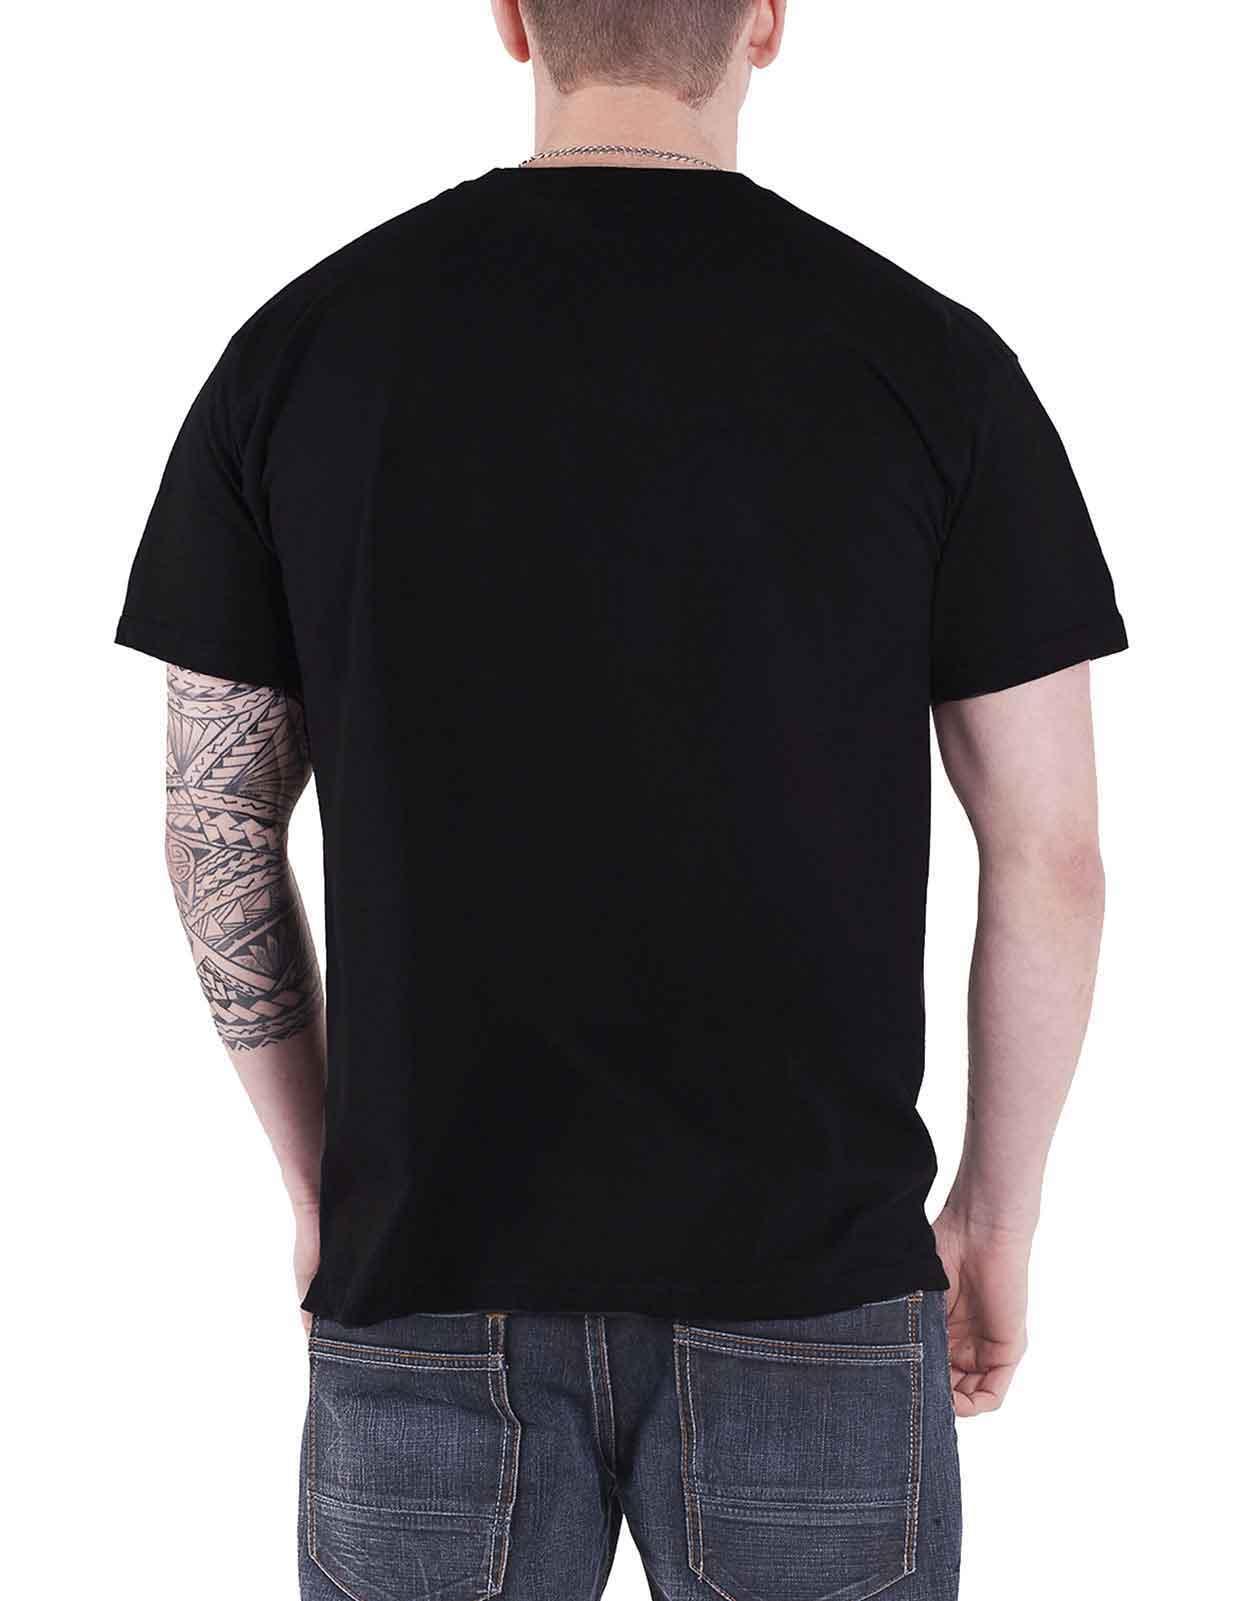 Official-Iron-Maiden-T-shirt-book-of-souls-trooper-killers-tour-band-logo-mens miniatuur 83